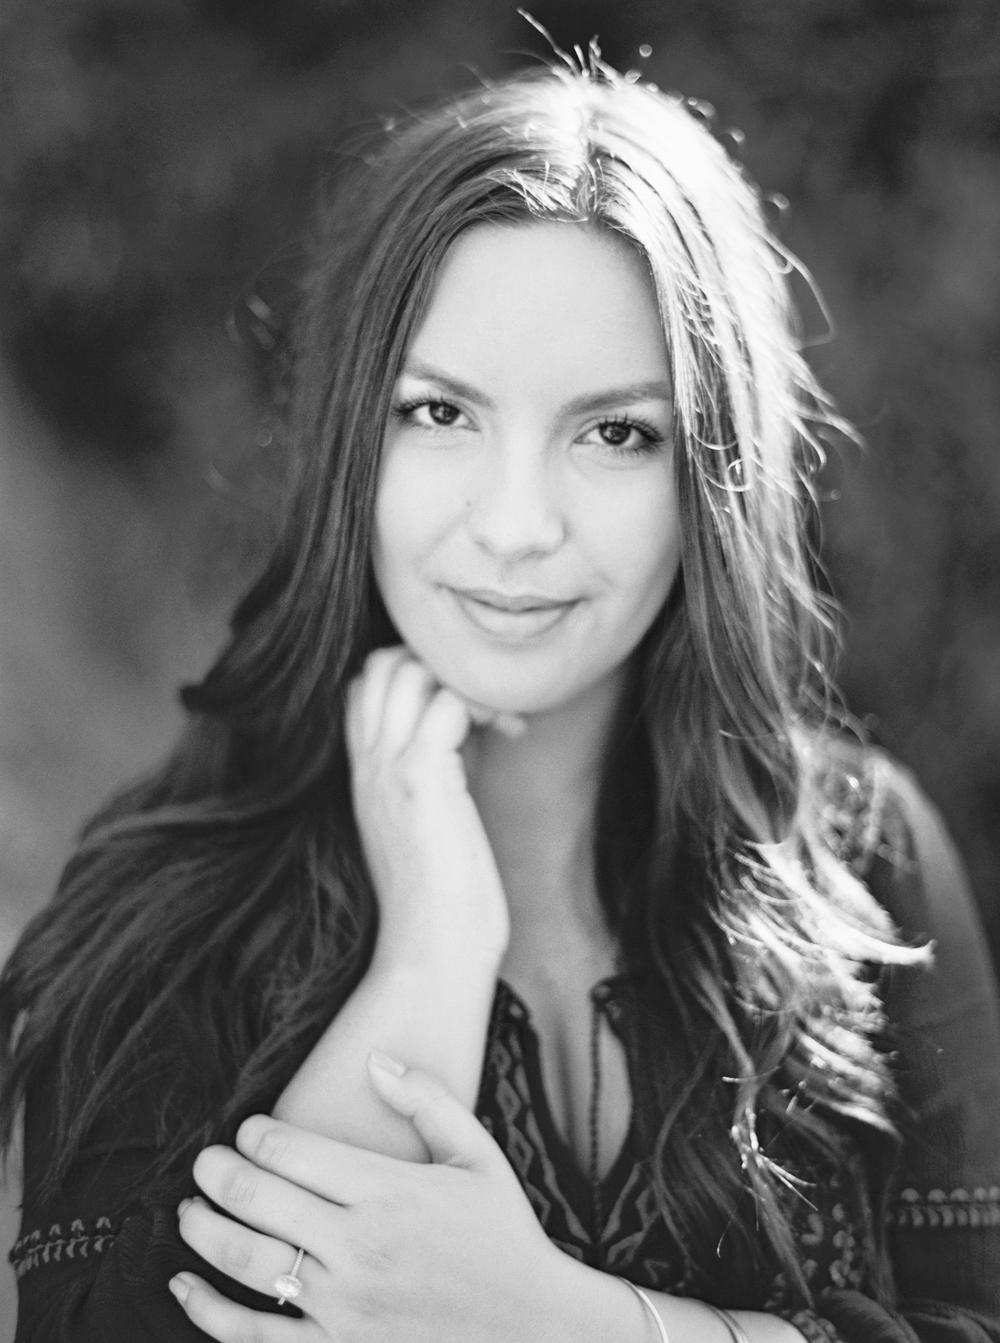 Megan Welker, Photographer